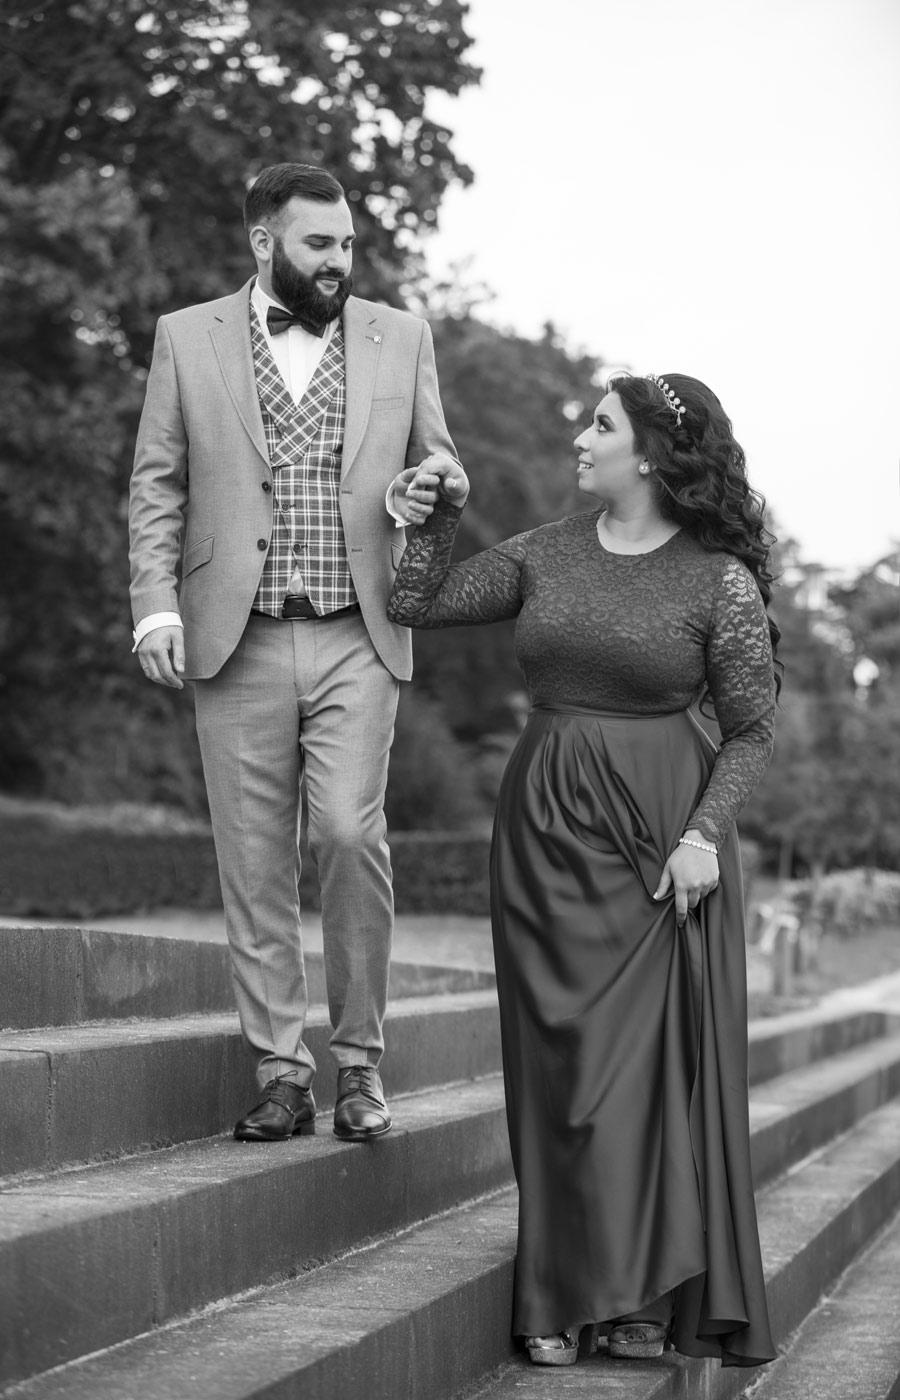 Studioart-Photography-Hochzeitsshooting-Oktober-3